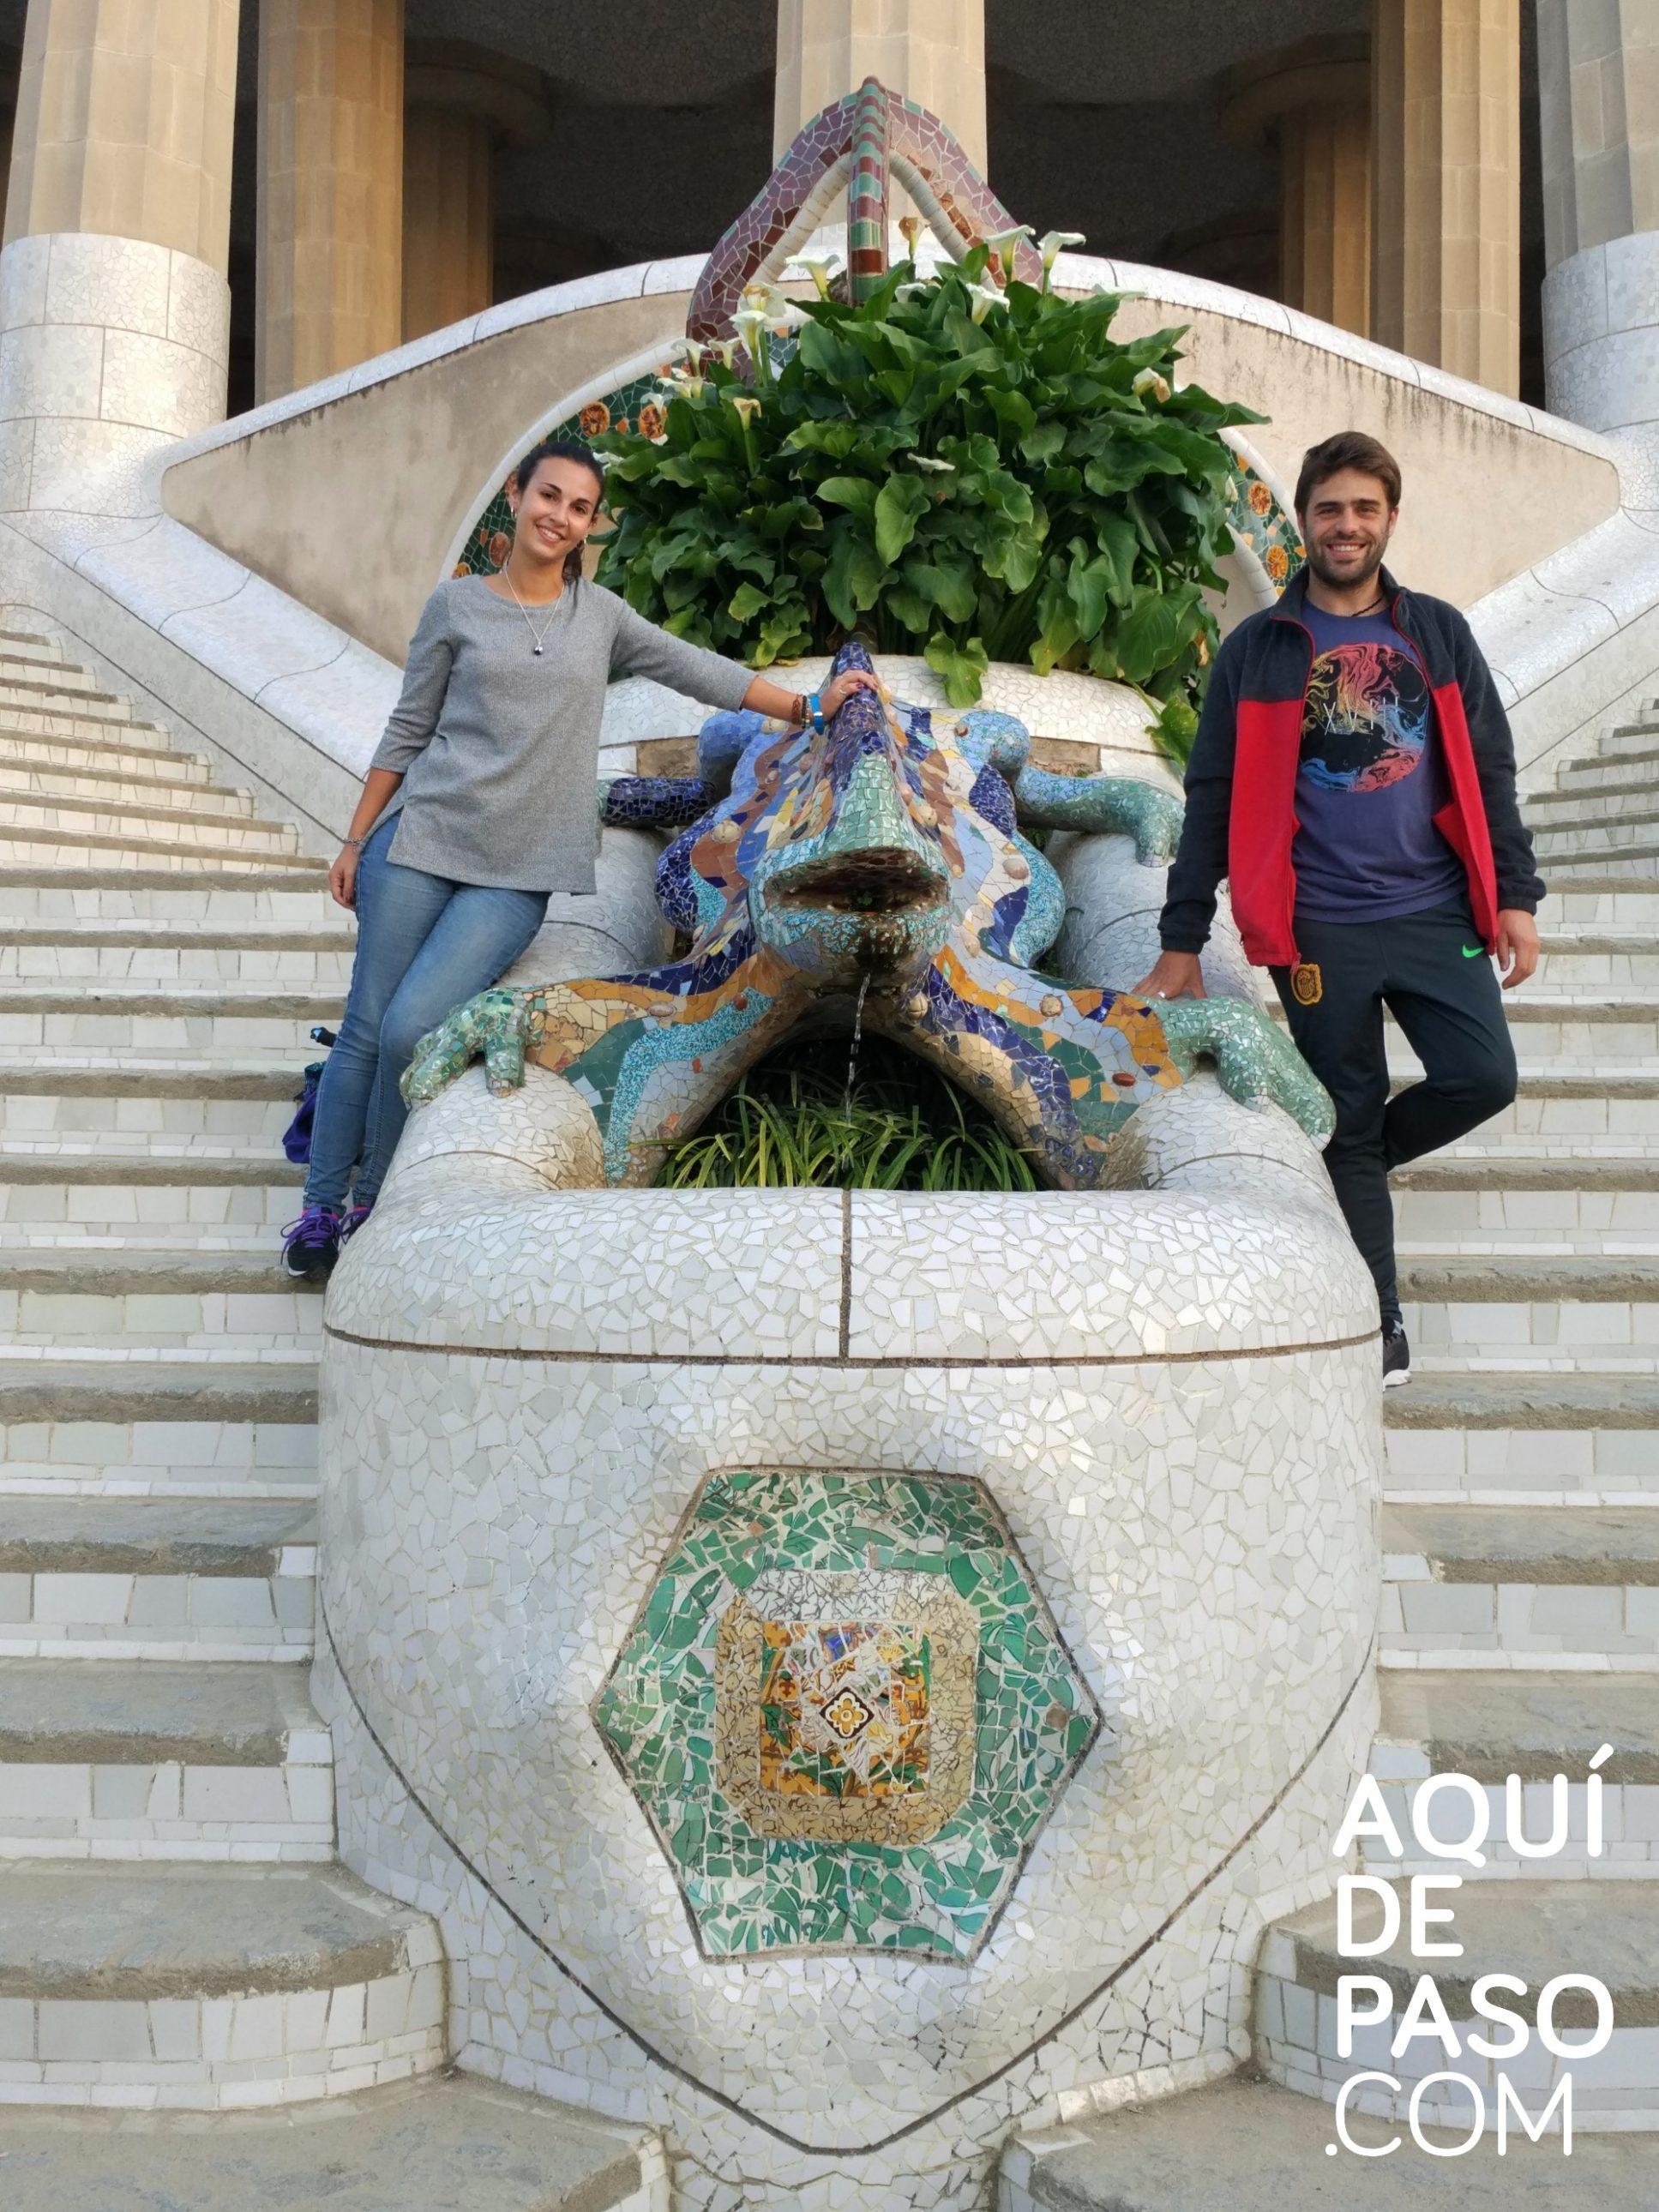 Alojamiento y transporte 3 Barcelona